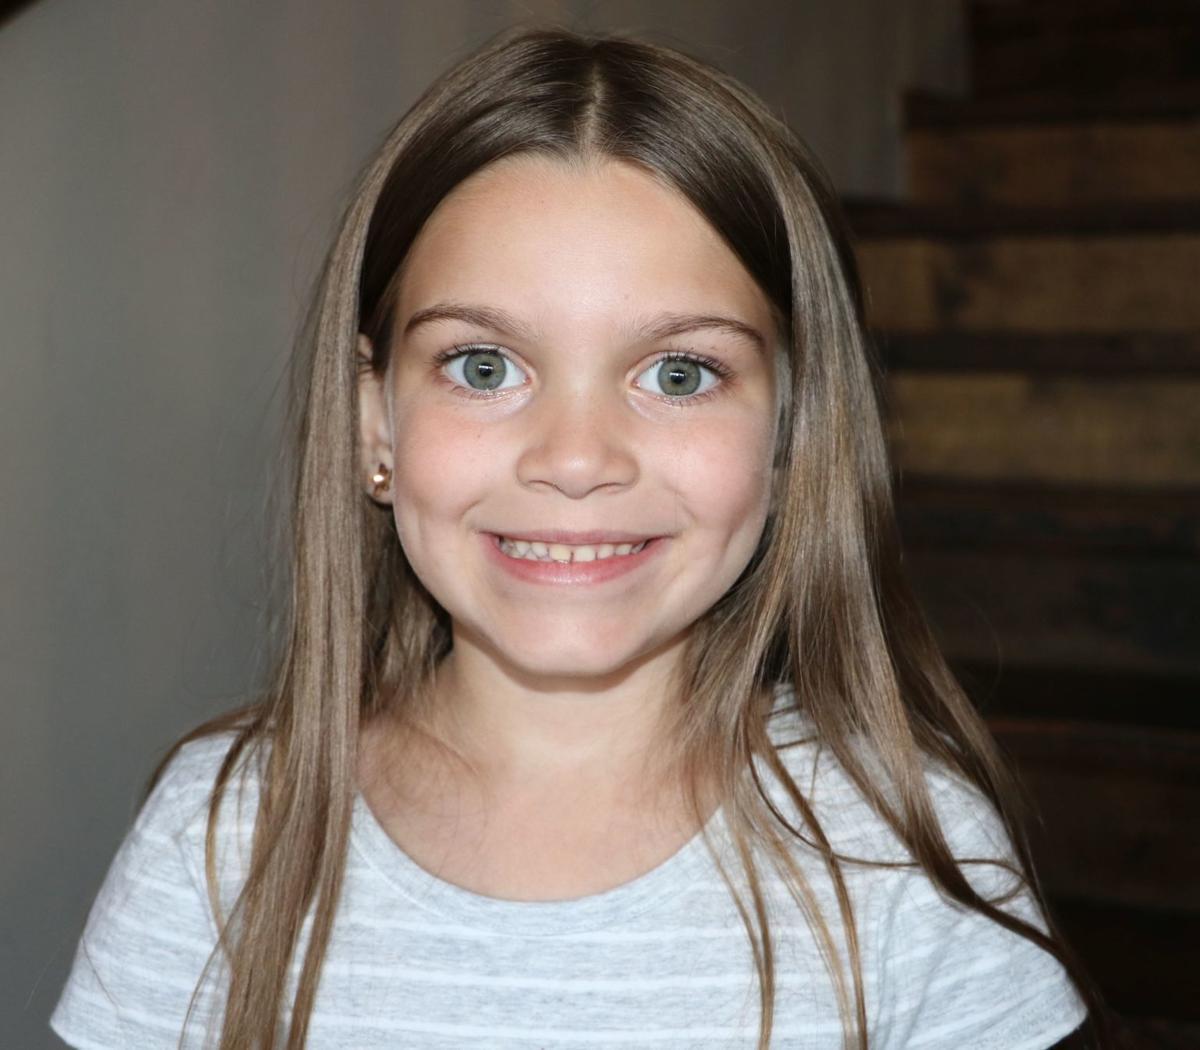 Little Miss Fall Festival Contestant